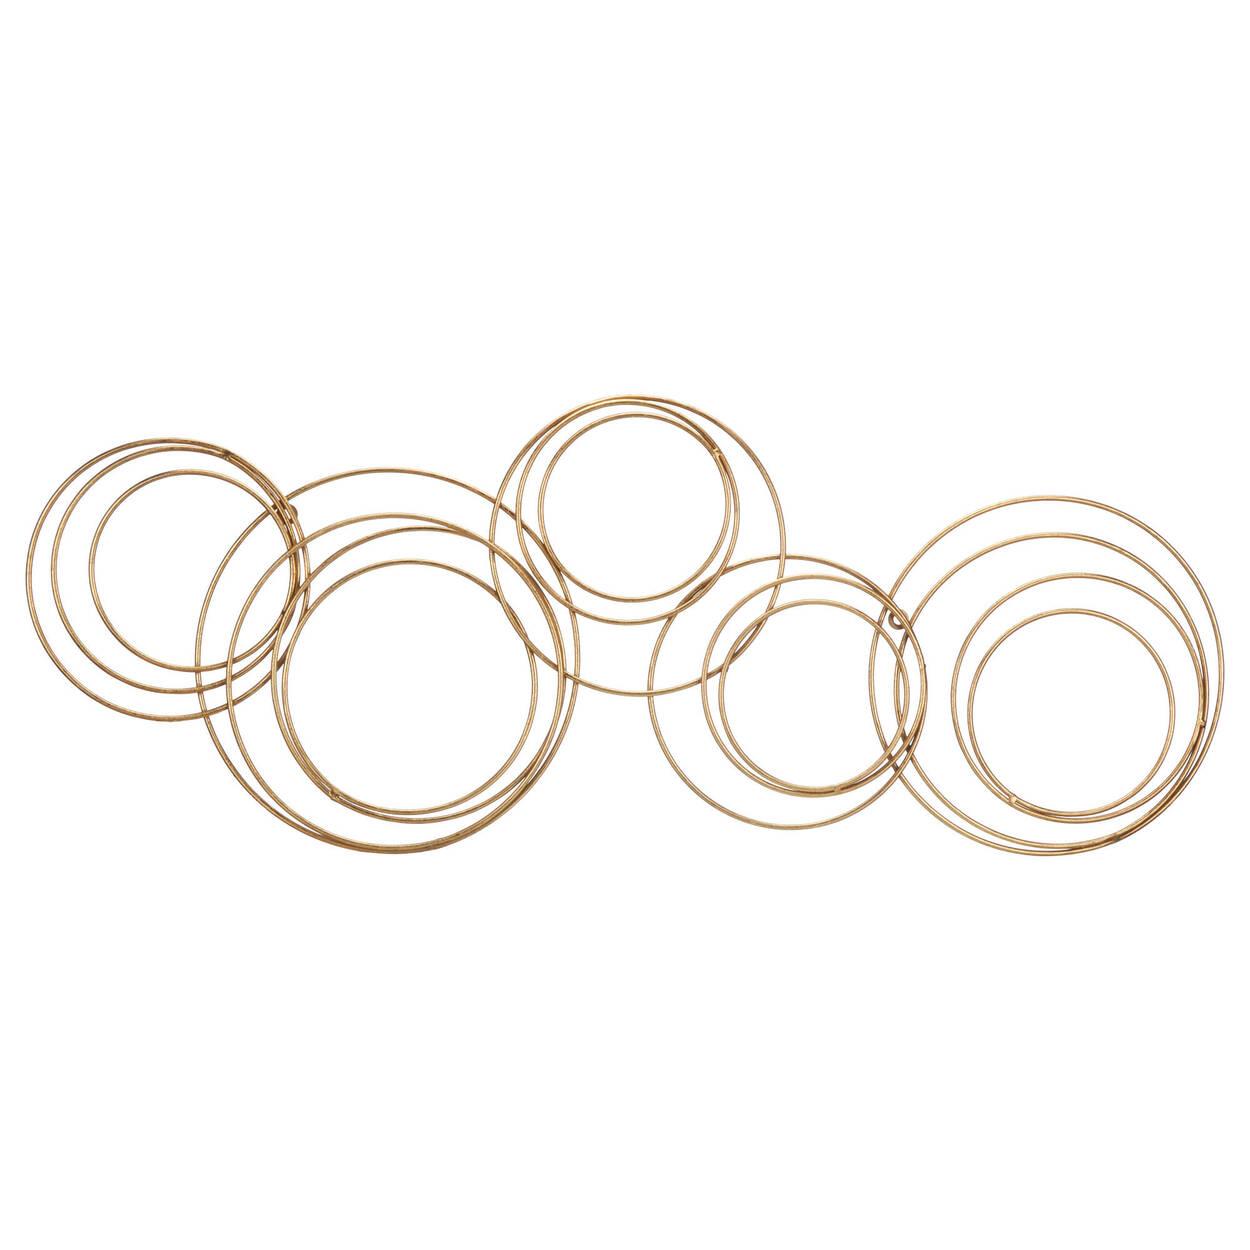 Metal Multi-Rings Wall Art